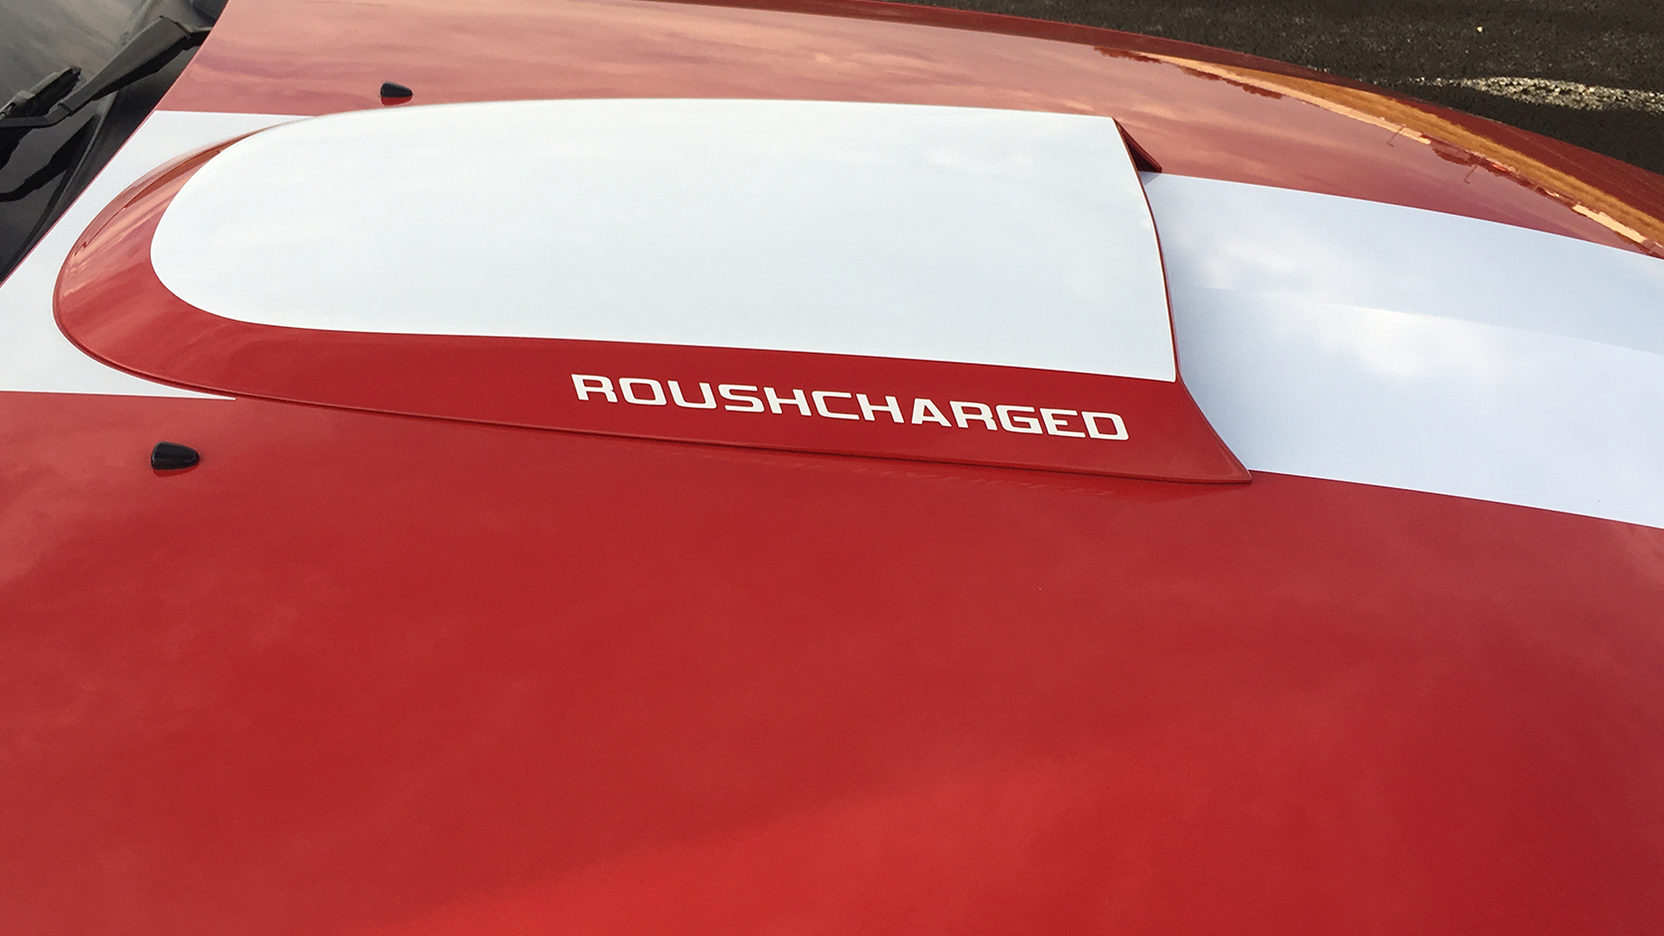 2007 Roush 427r Mustang White Rear